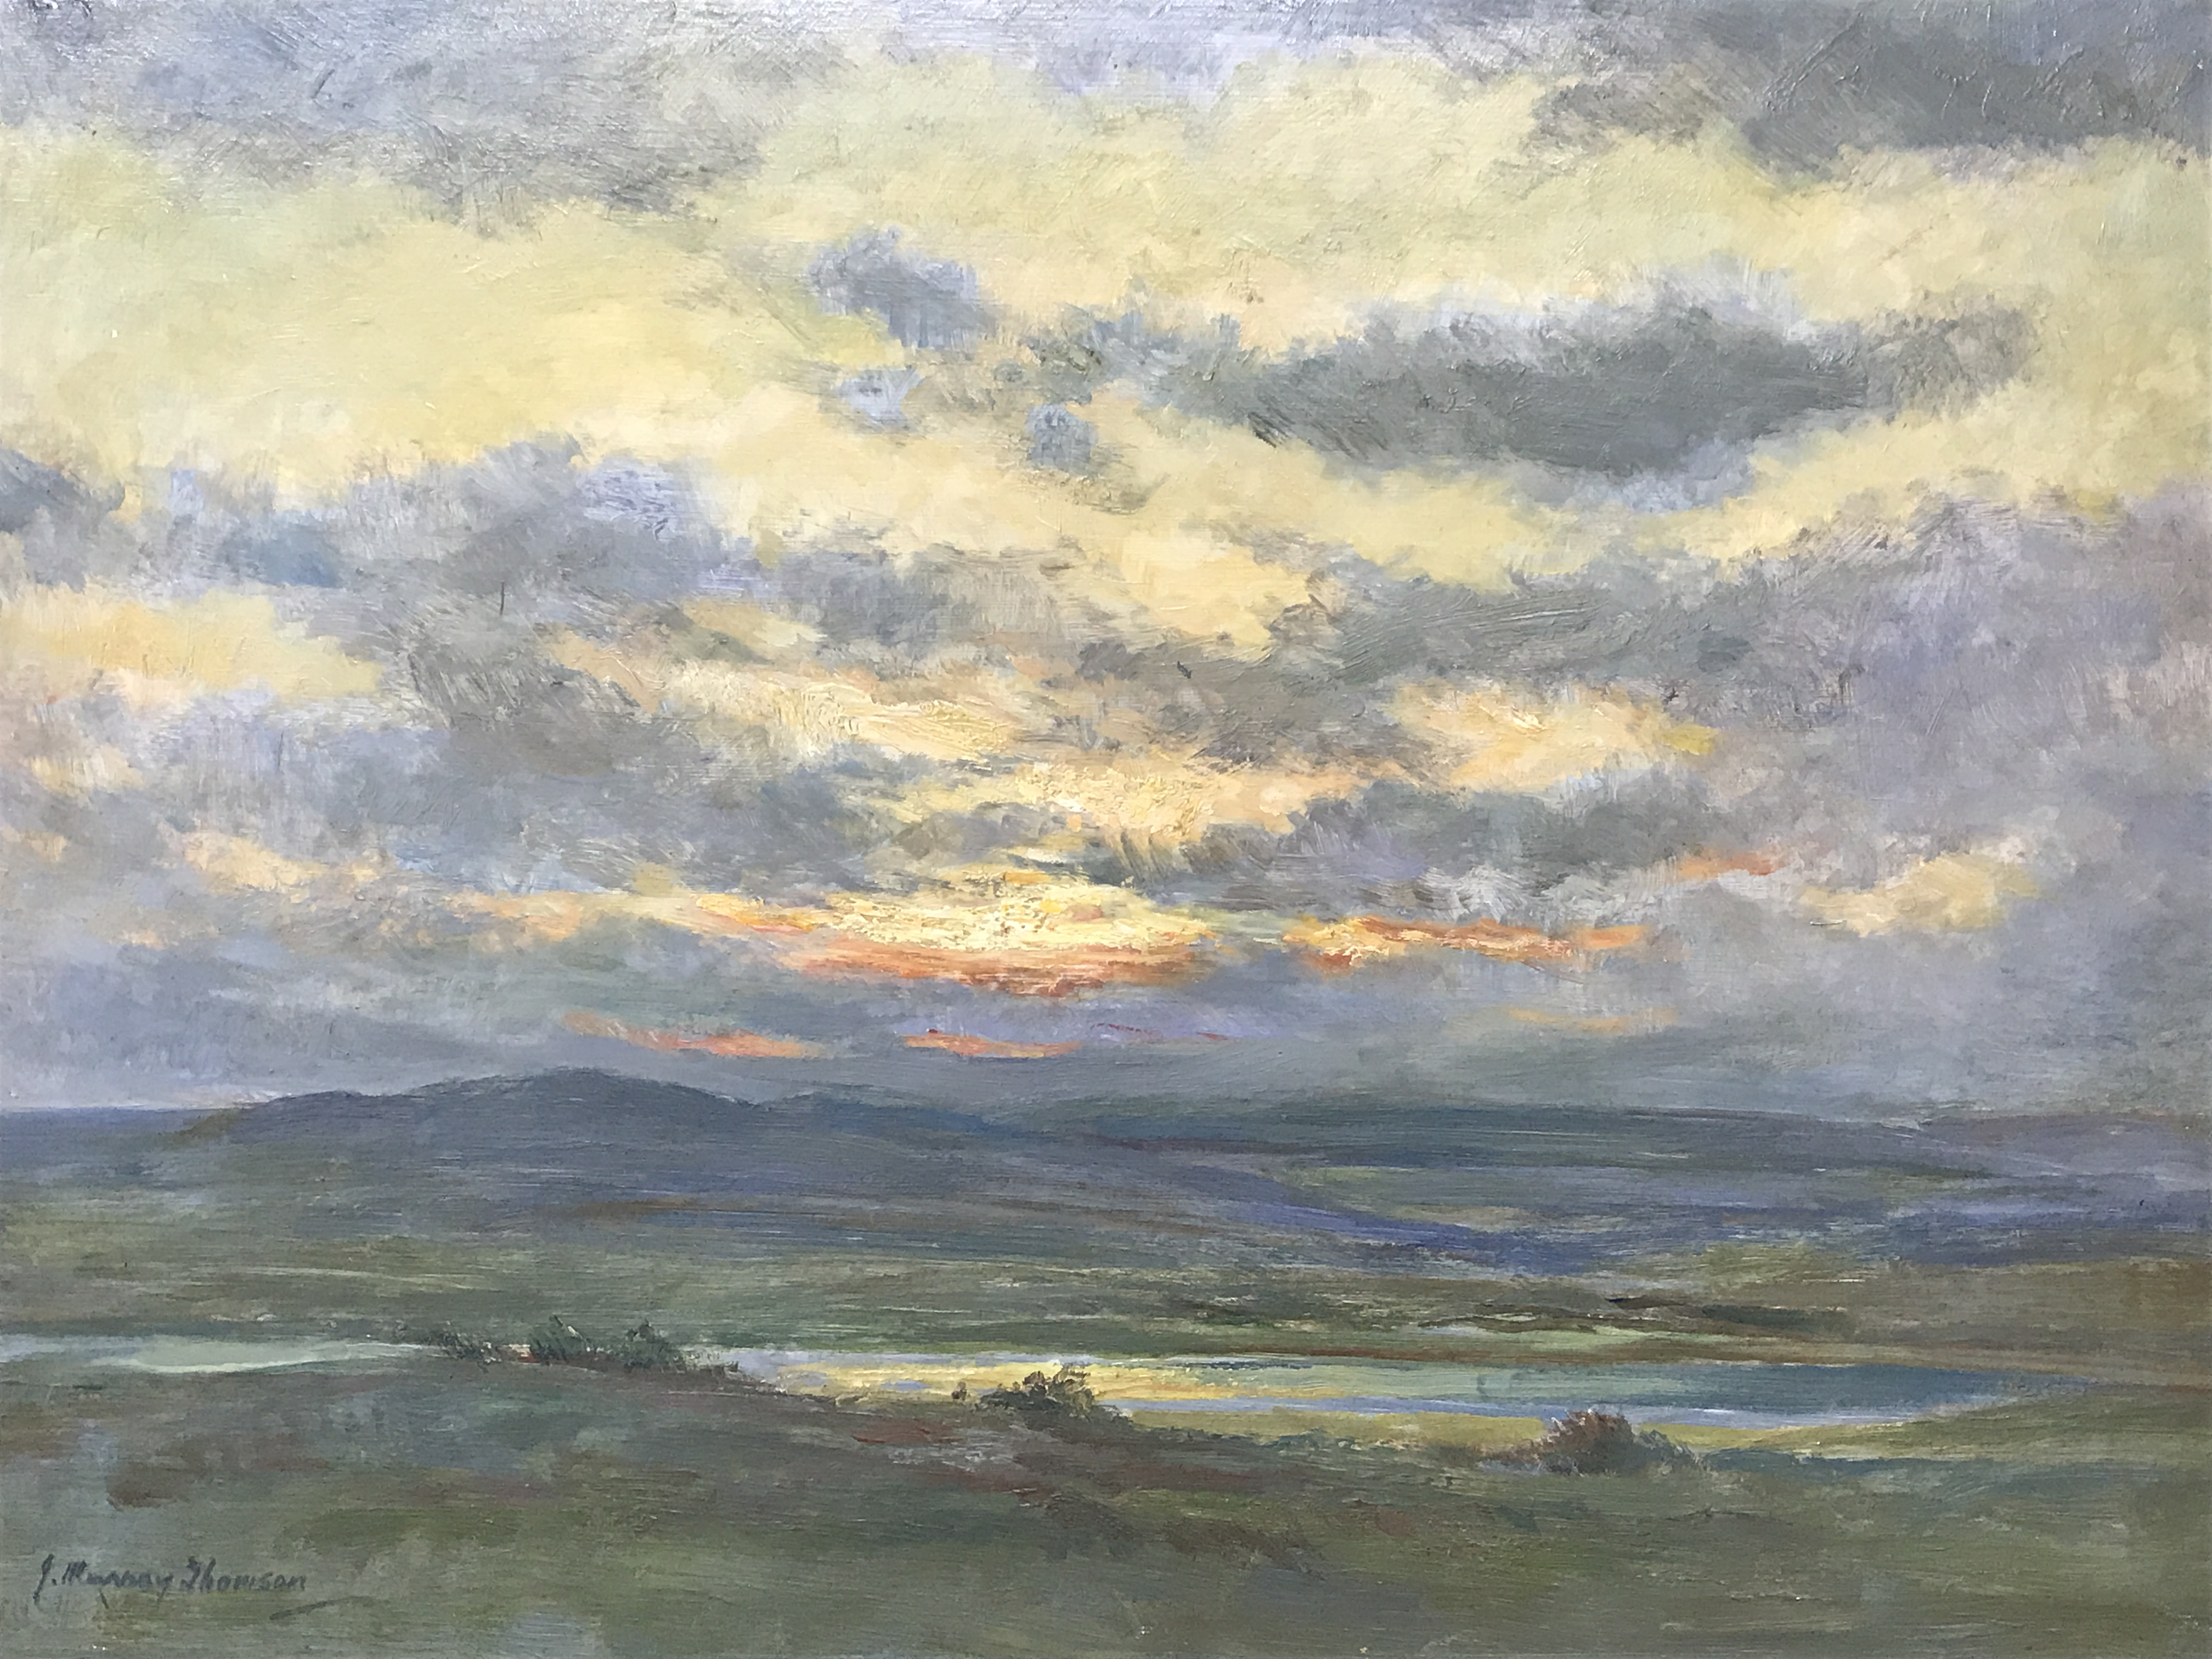 John Murray Thomson 1885-1974